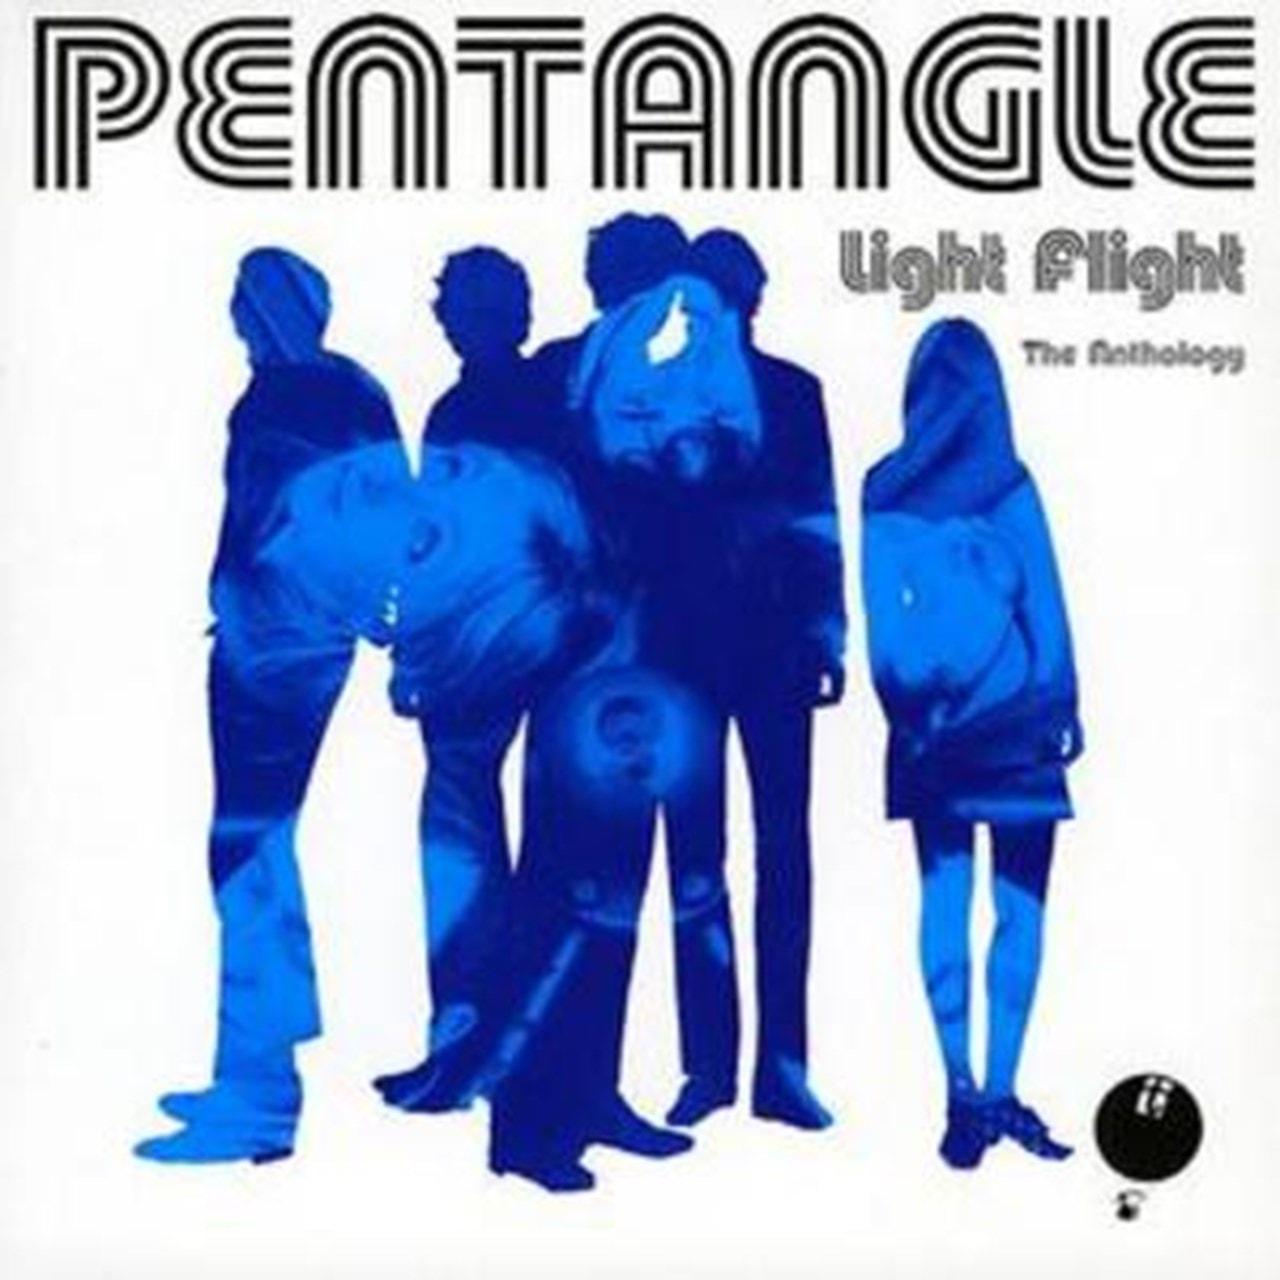 Light Flight - The Anthology - 1